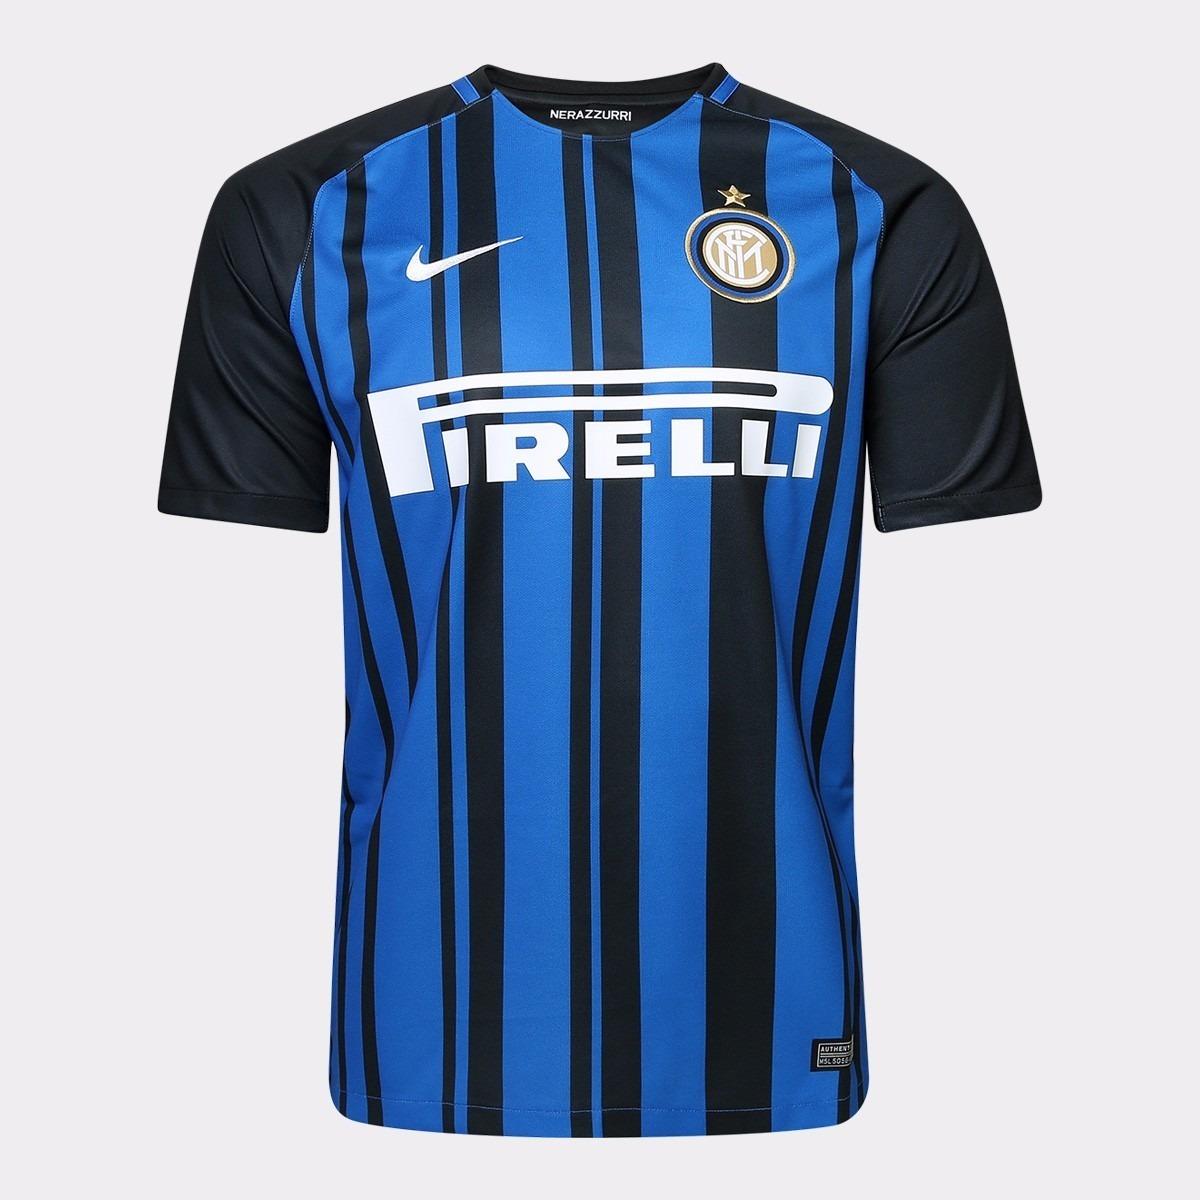 7e1cbdebca Camisa Barata Futebol Italiano 2017 2018 - R  49